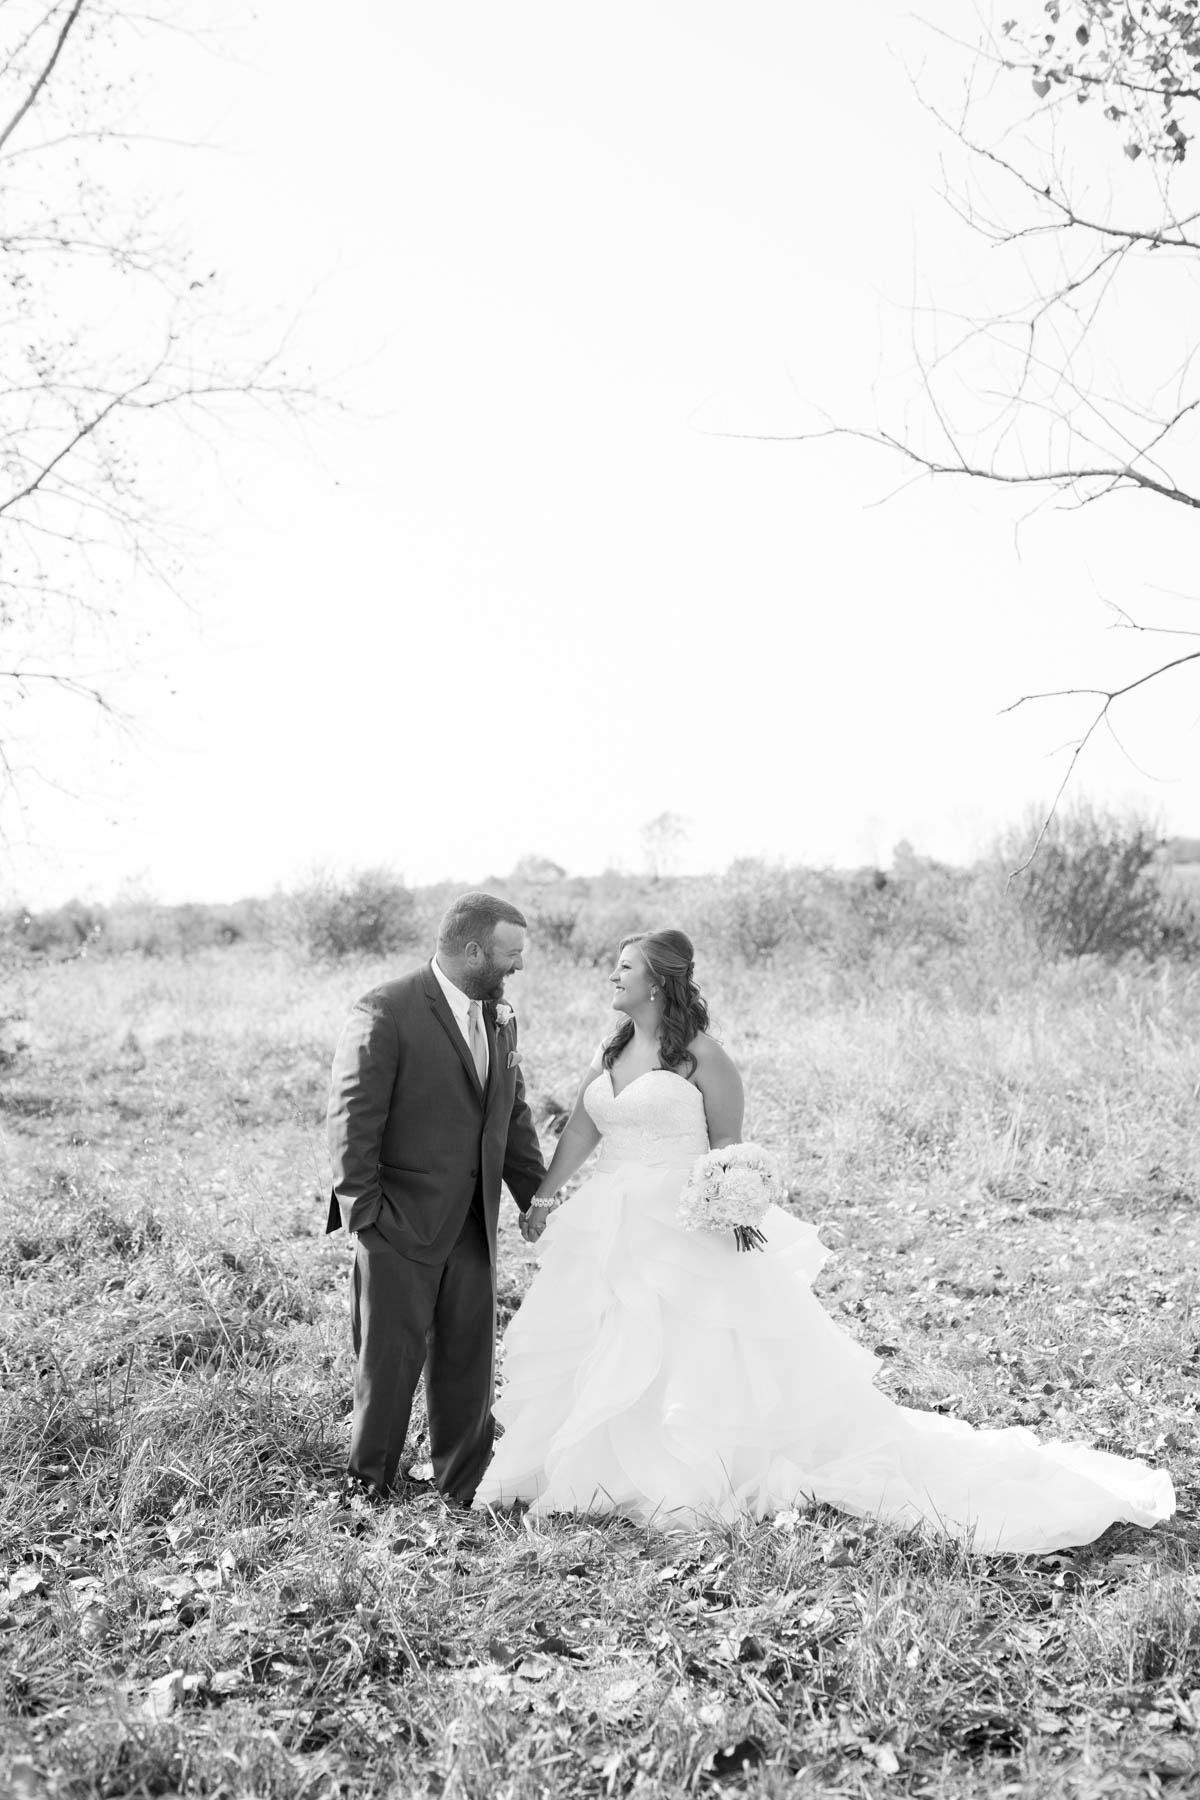 shotbychelsea_blog_wedding-19.jpg